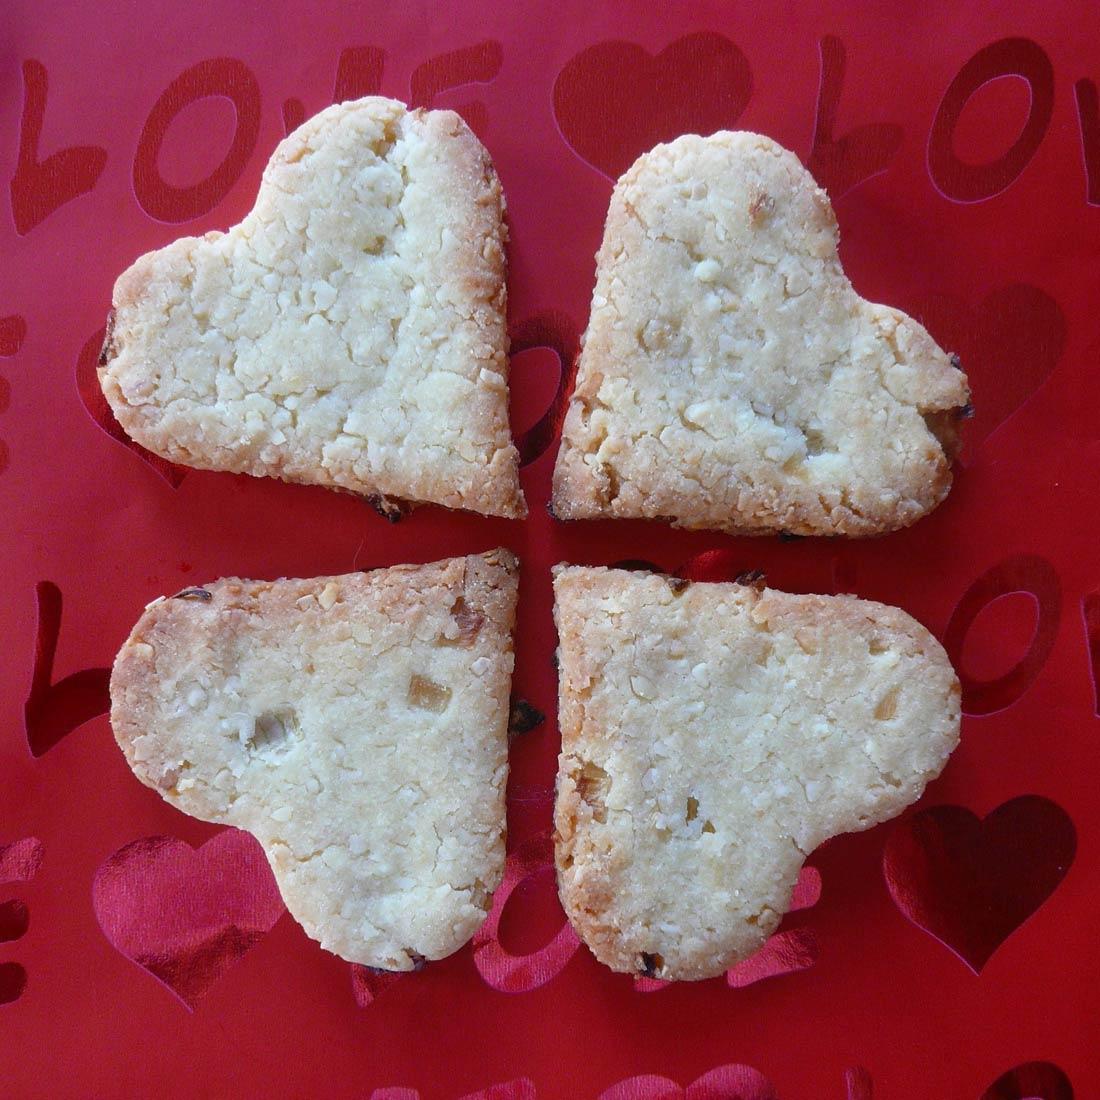 Apéricoeurs, une recette originale de gâteaux apéritif